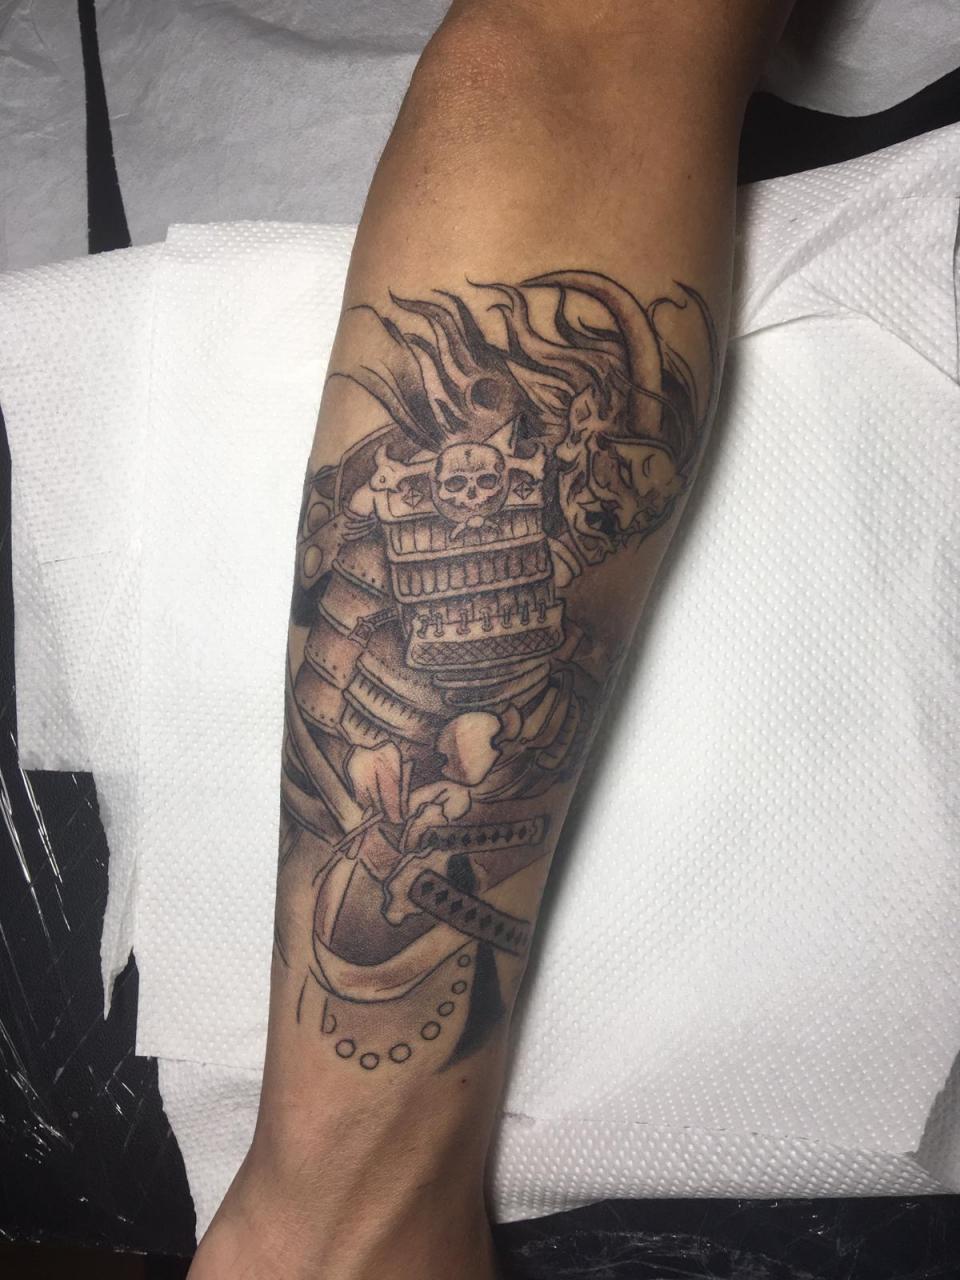 Latest tattoo ,done by thefakebrush